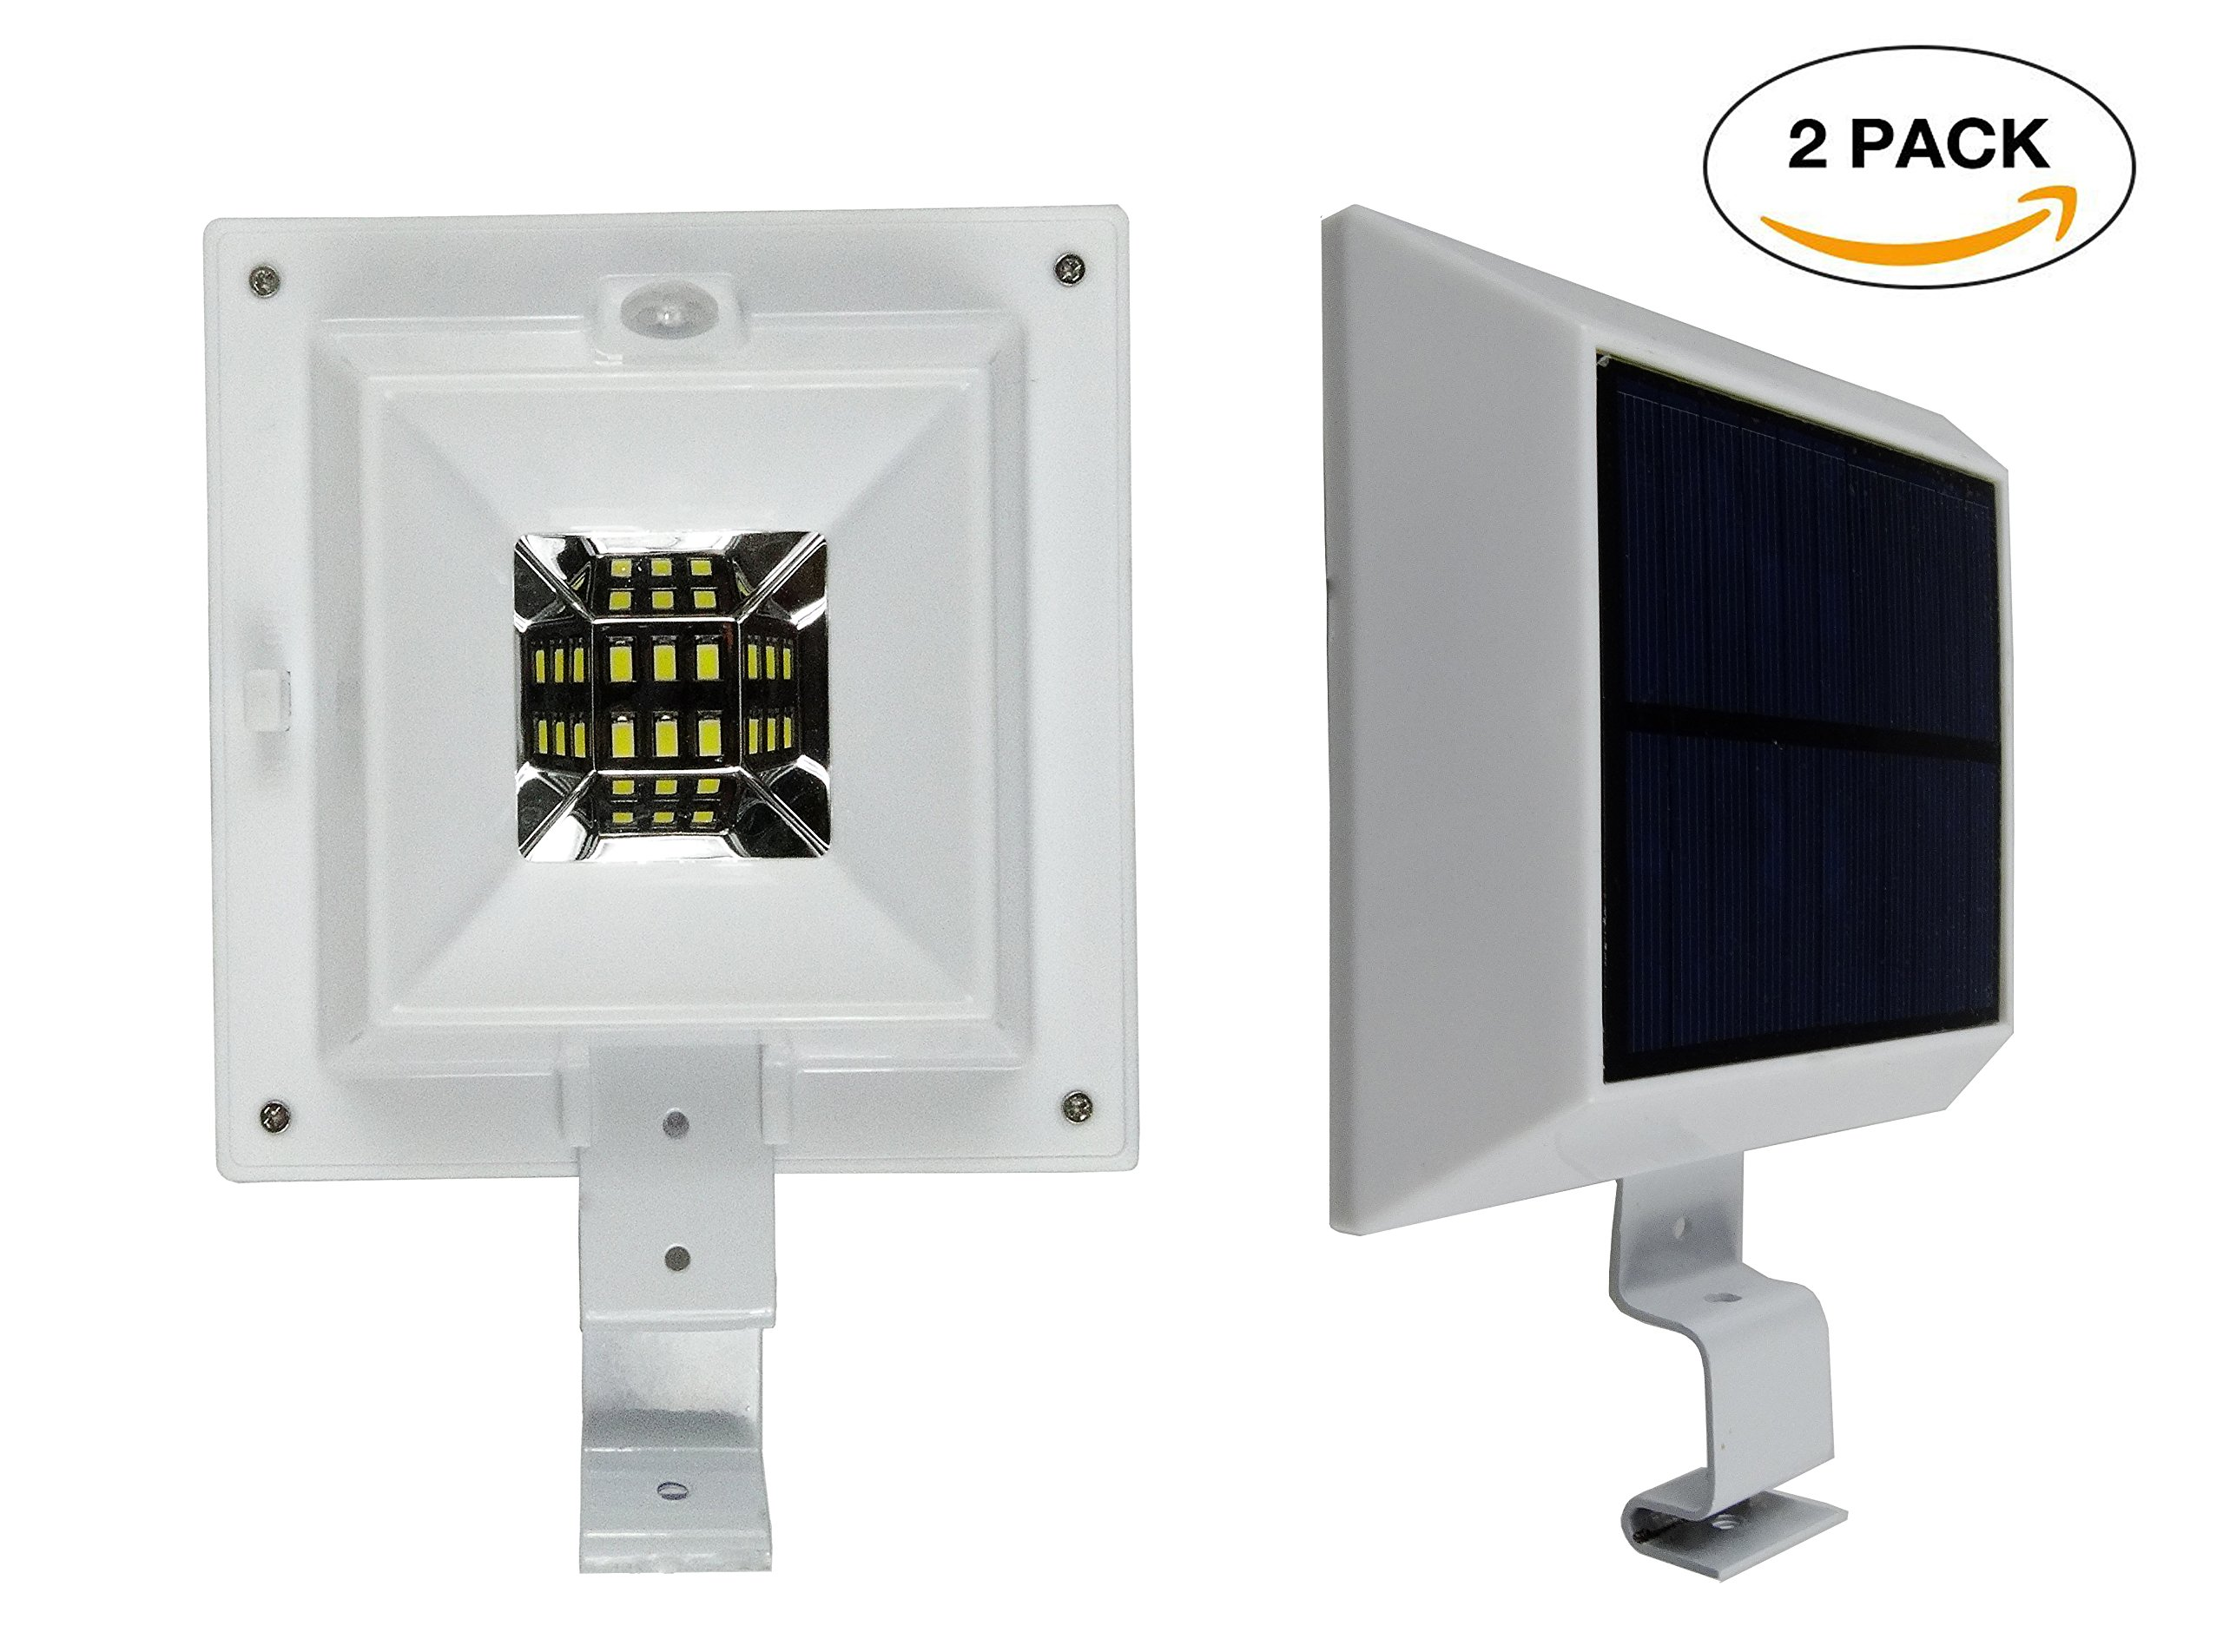 Solar Lights Outdoor 6 LED PIR Motion Sensor Wall Light Outdoor Waterproof Security Light Patio Deck Lights with Bracket Cool White 2 Packs